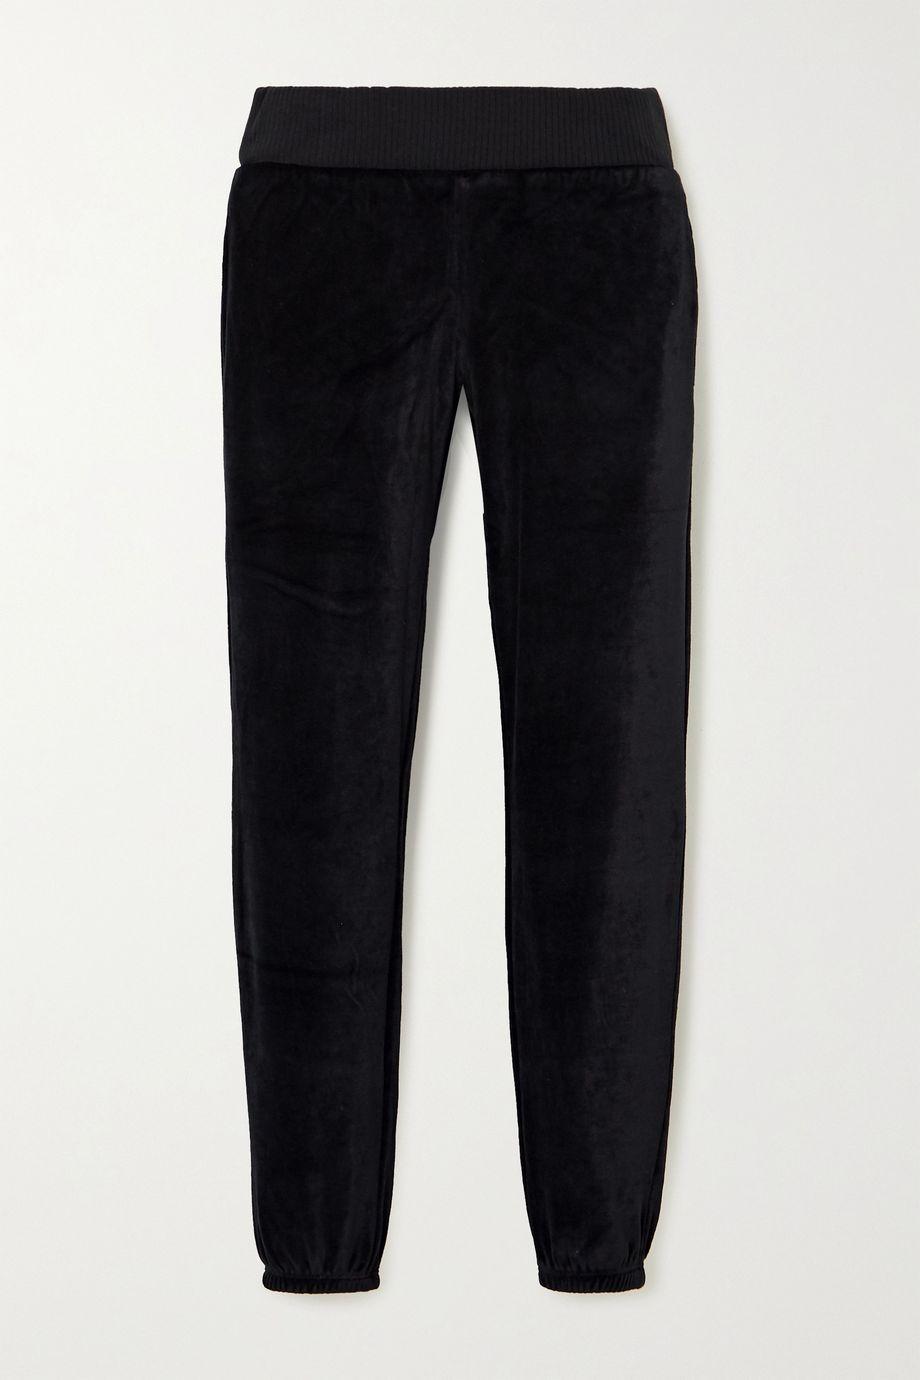 calé Celeste stretch-velour track pants